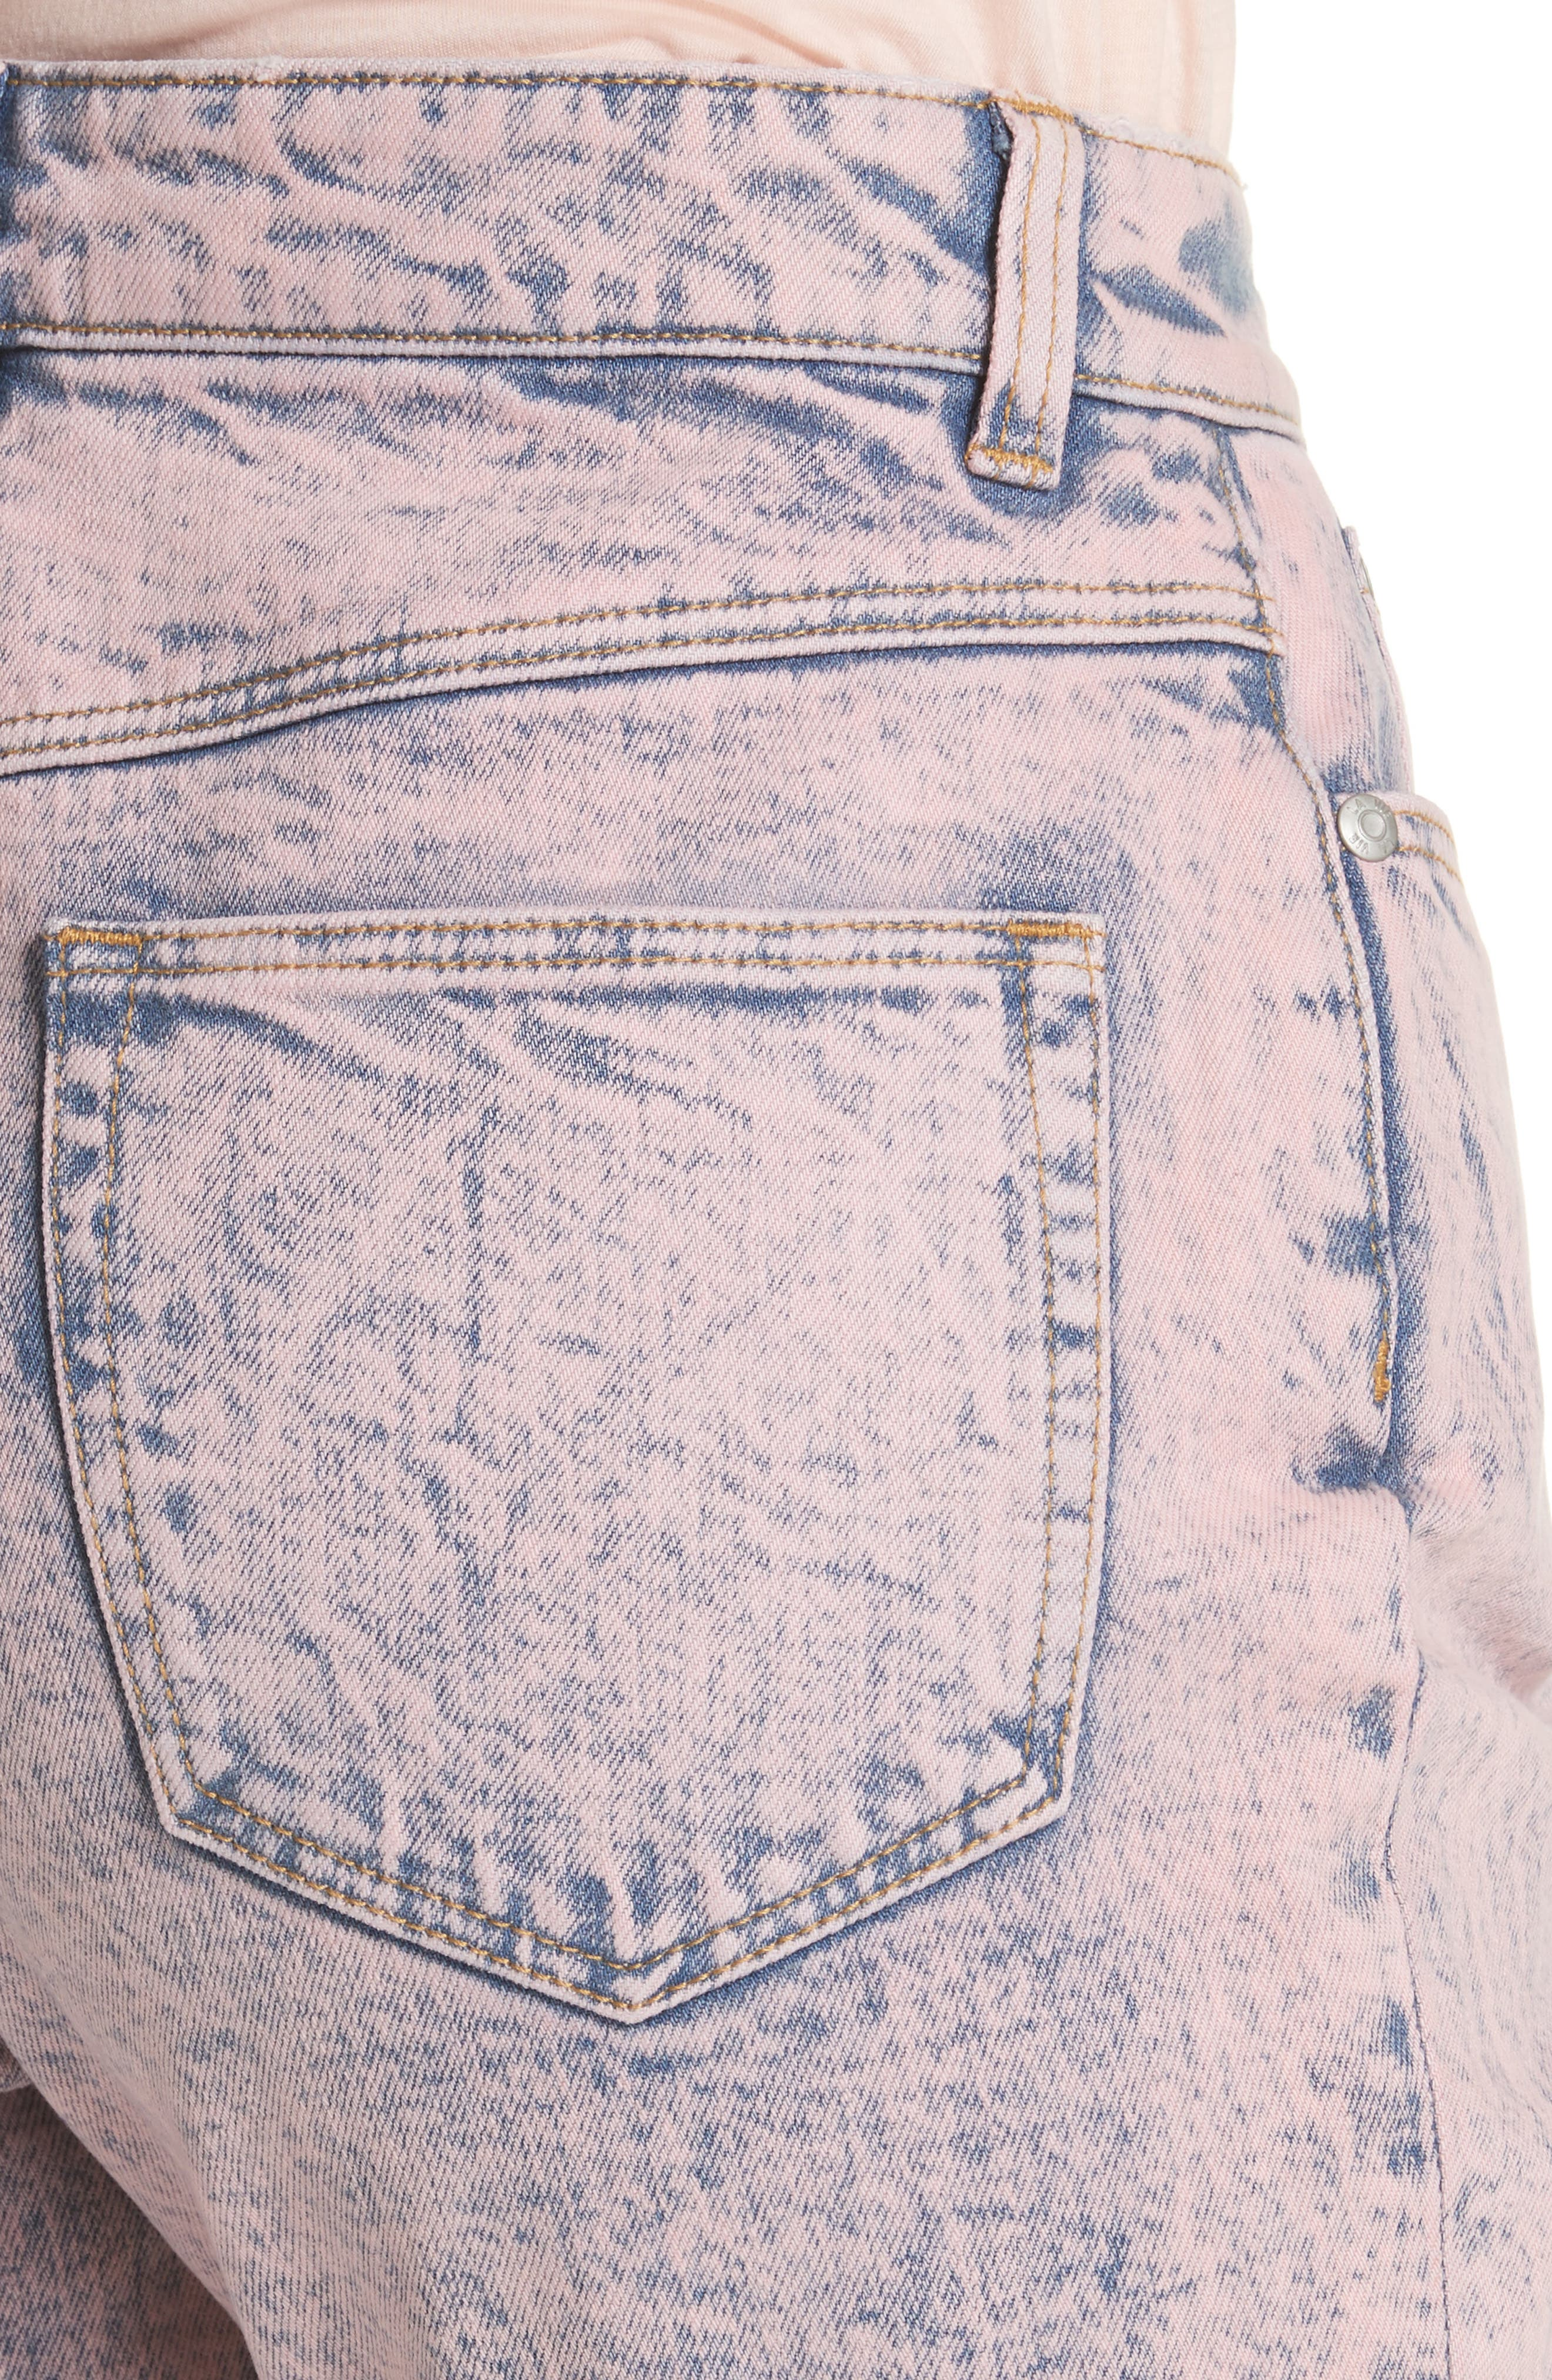 Ines Acid Wash Crop Jeans,                             Alternate thumbnail 4, color,